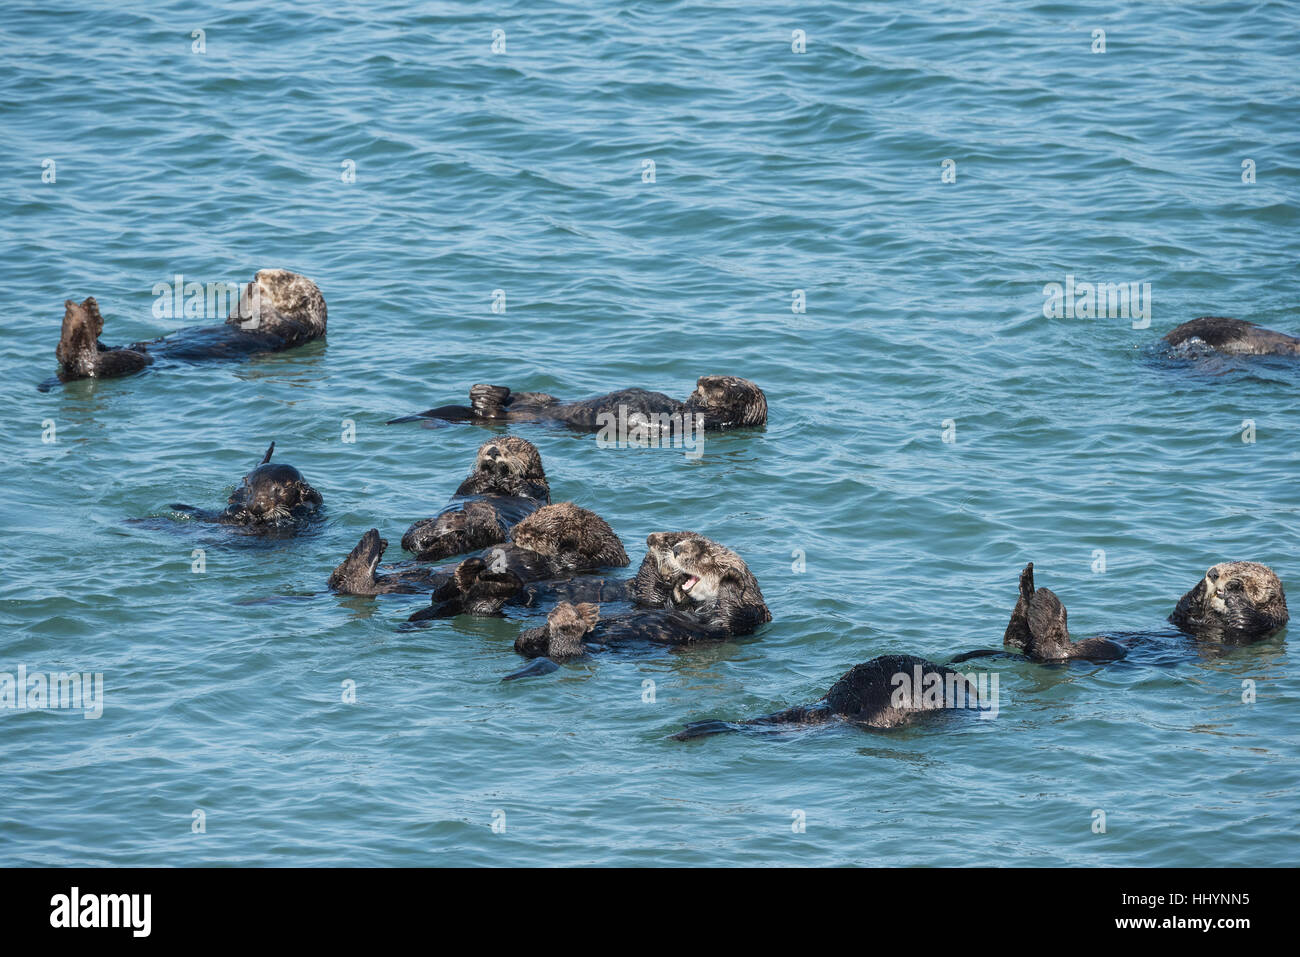 California Seeotter oder südlichen Seeotter, Enhydra Lutris Nereis (bedroht), ruht in einem Floß Elkhorn Slough, Moss Landing, California, USA Stockfoto